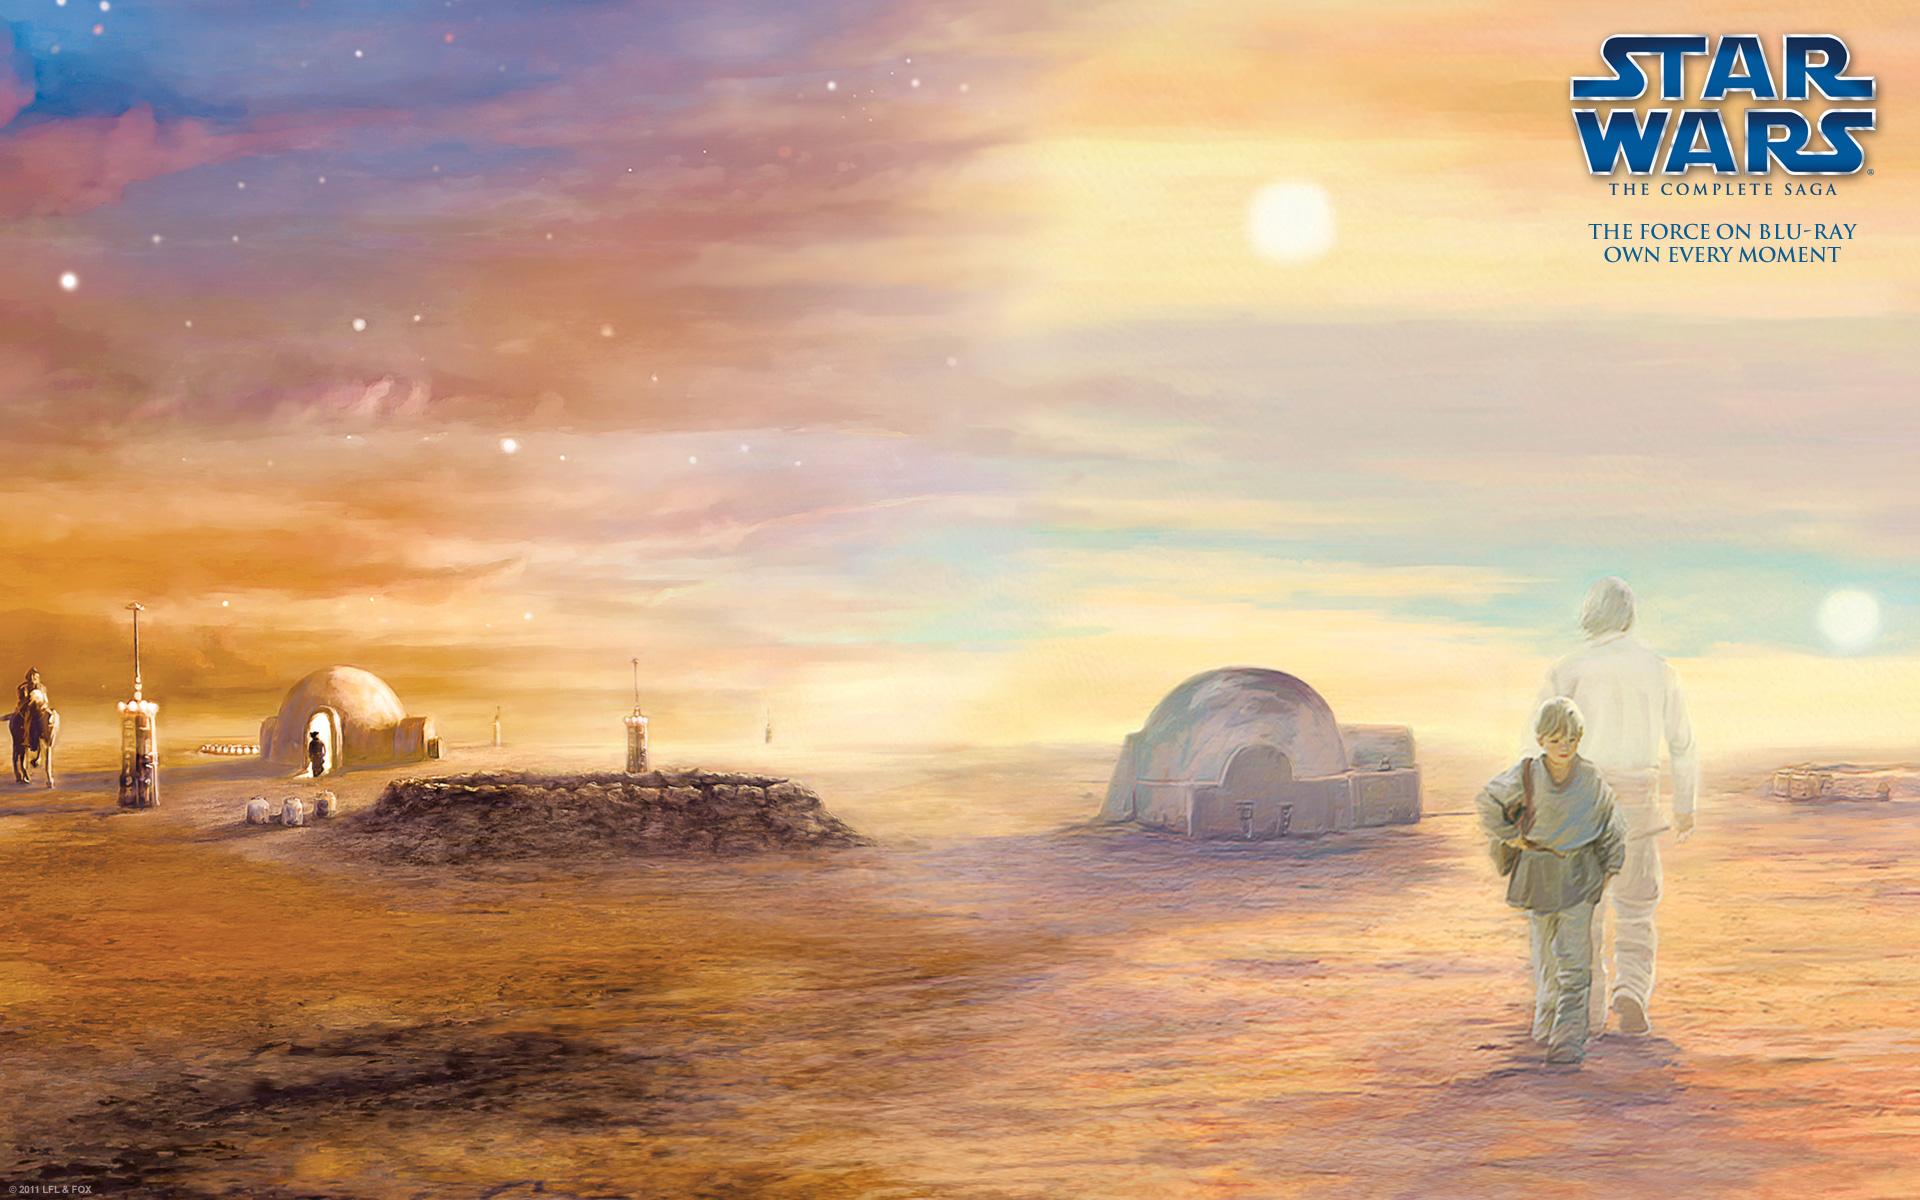 The Star Wars Blu-ray box set artwork